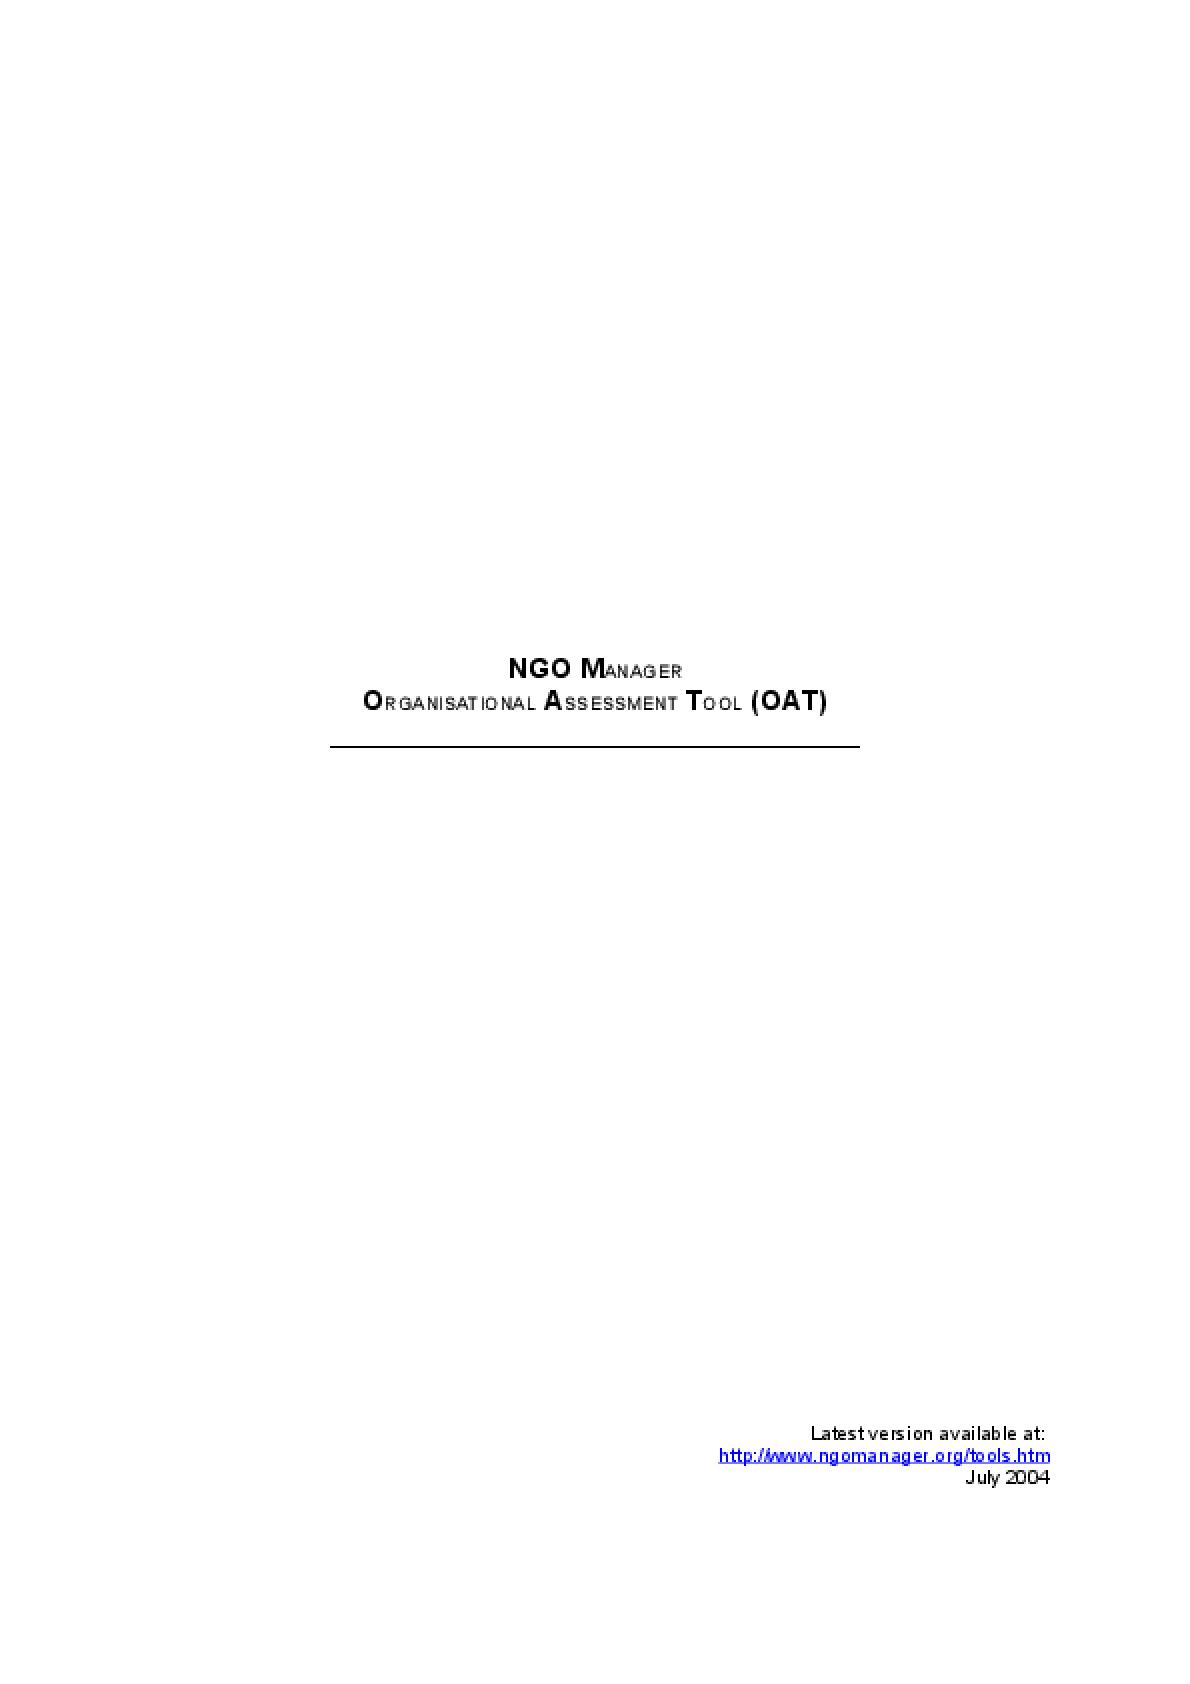 NGO Manager Organisational Assessment Tool (OAT)